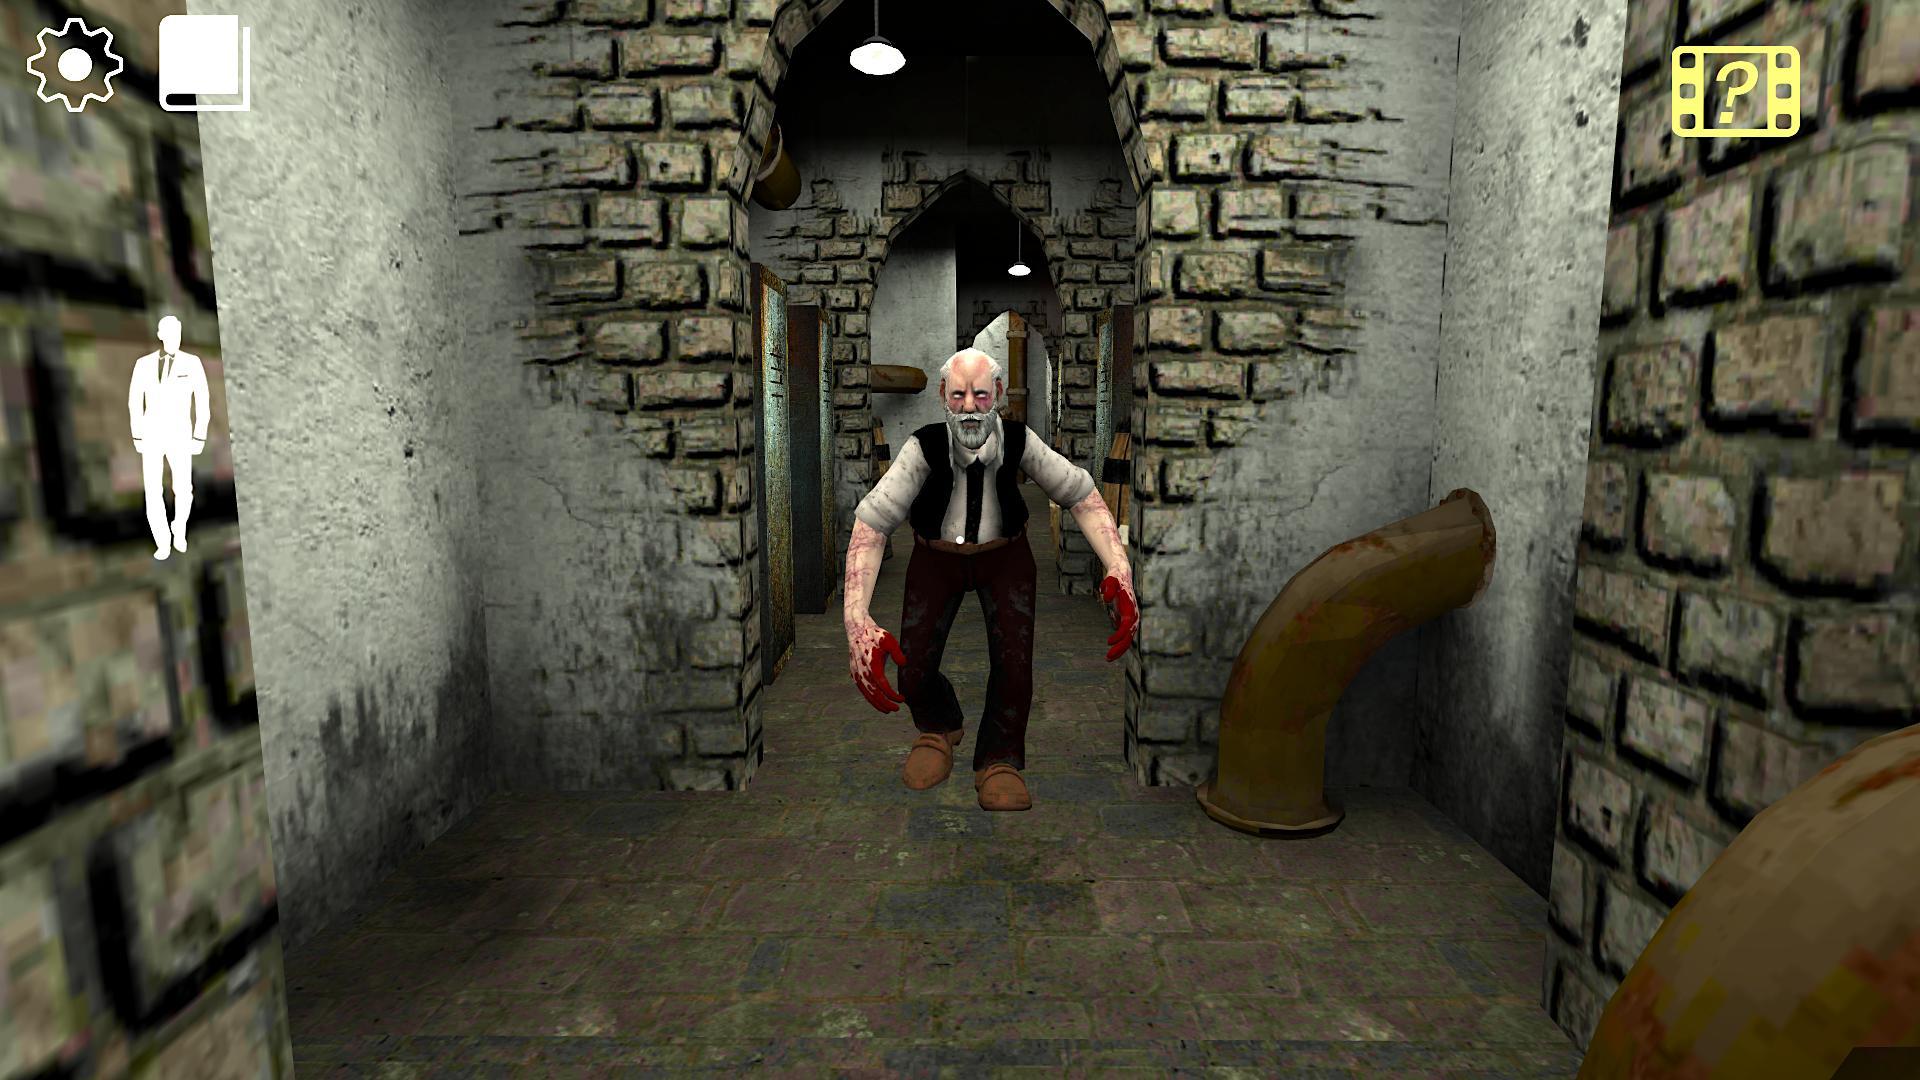 Evil Erich Sann : The New Horror Games. 2.5.0 Screenshot 9